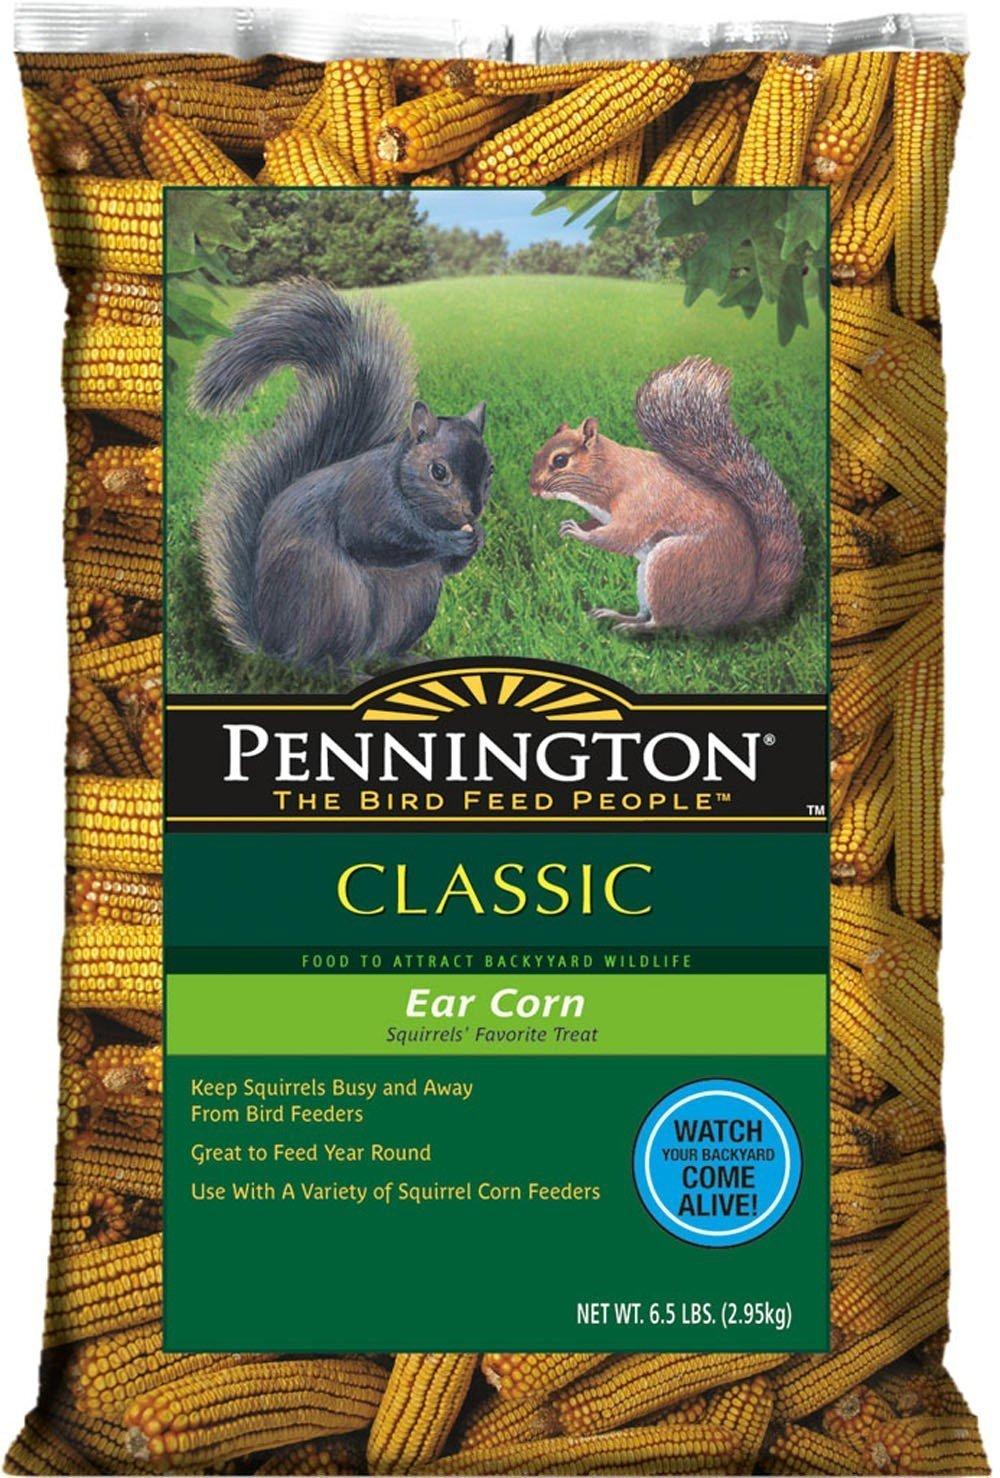 Pennington Ear Corn on Cob Squirrel Food, 6.5-Pound (3)